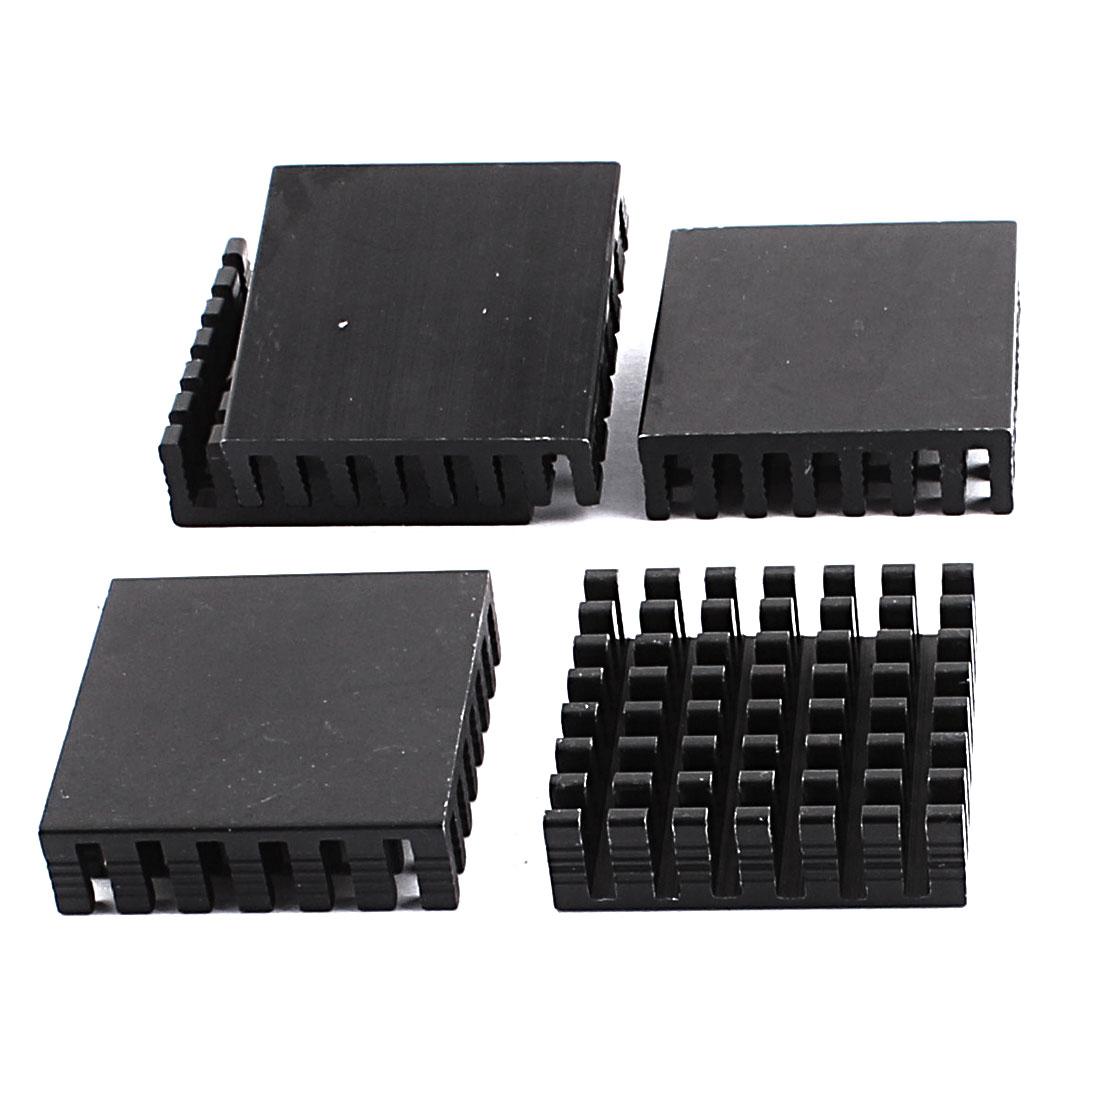 5pcs Aluminium 28x28x8mm Square Heatsink Heat Diffusion Cooling Cooler Fin Black